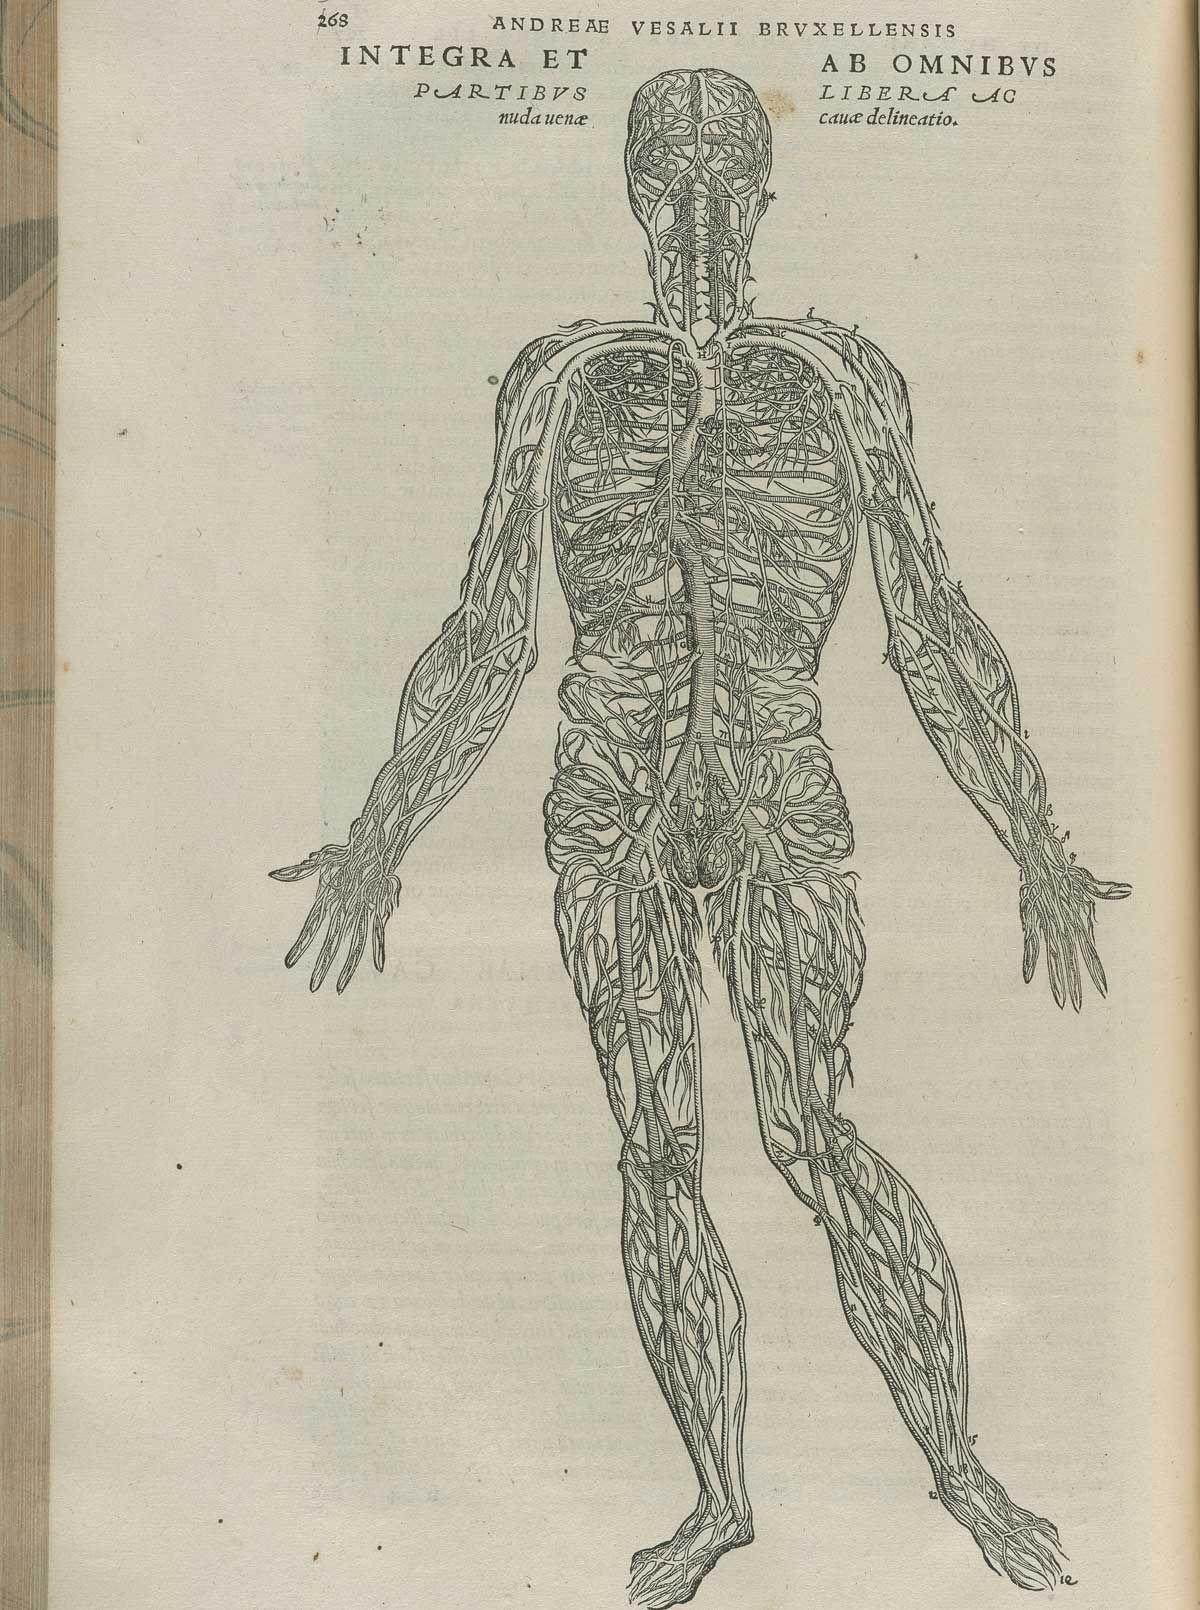 Andreas Vesalius De Corporis Fabrica Anatomy Pinterest